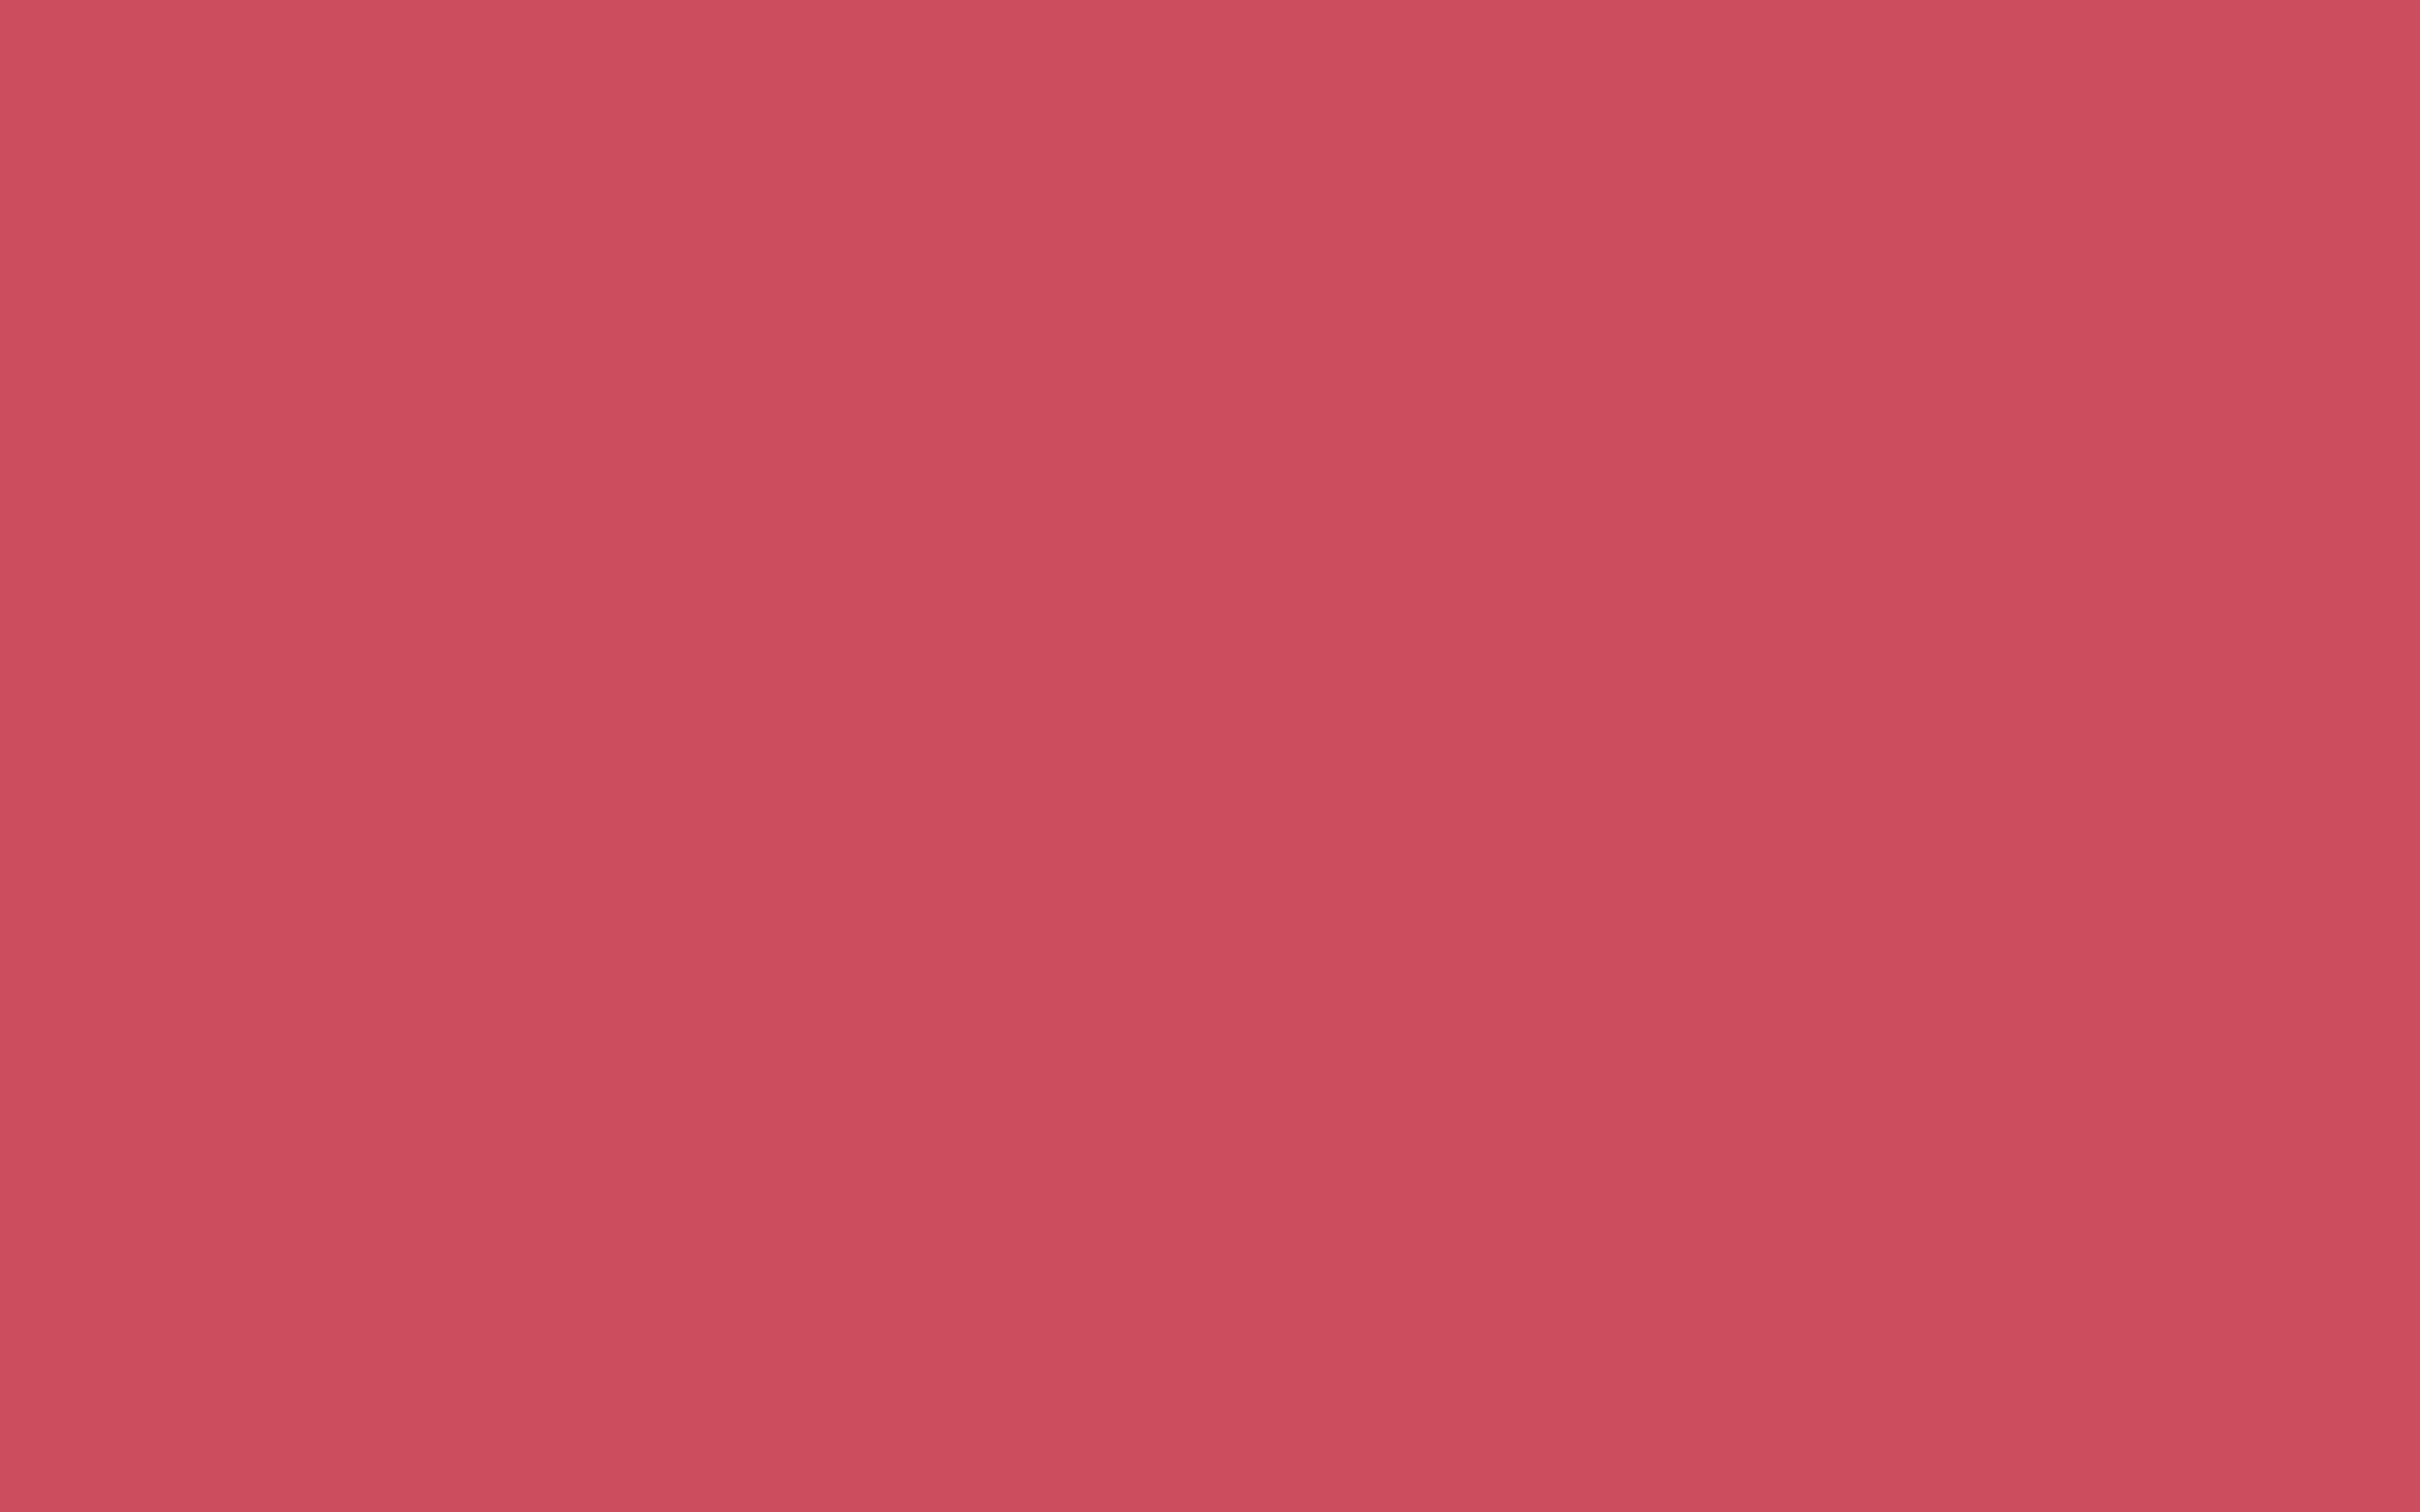 2560x1600 Dark Terra Cotta Solid Color Background